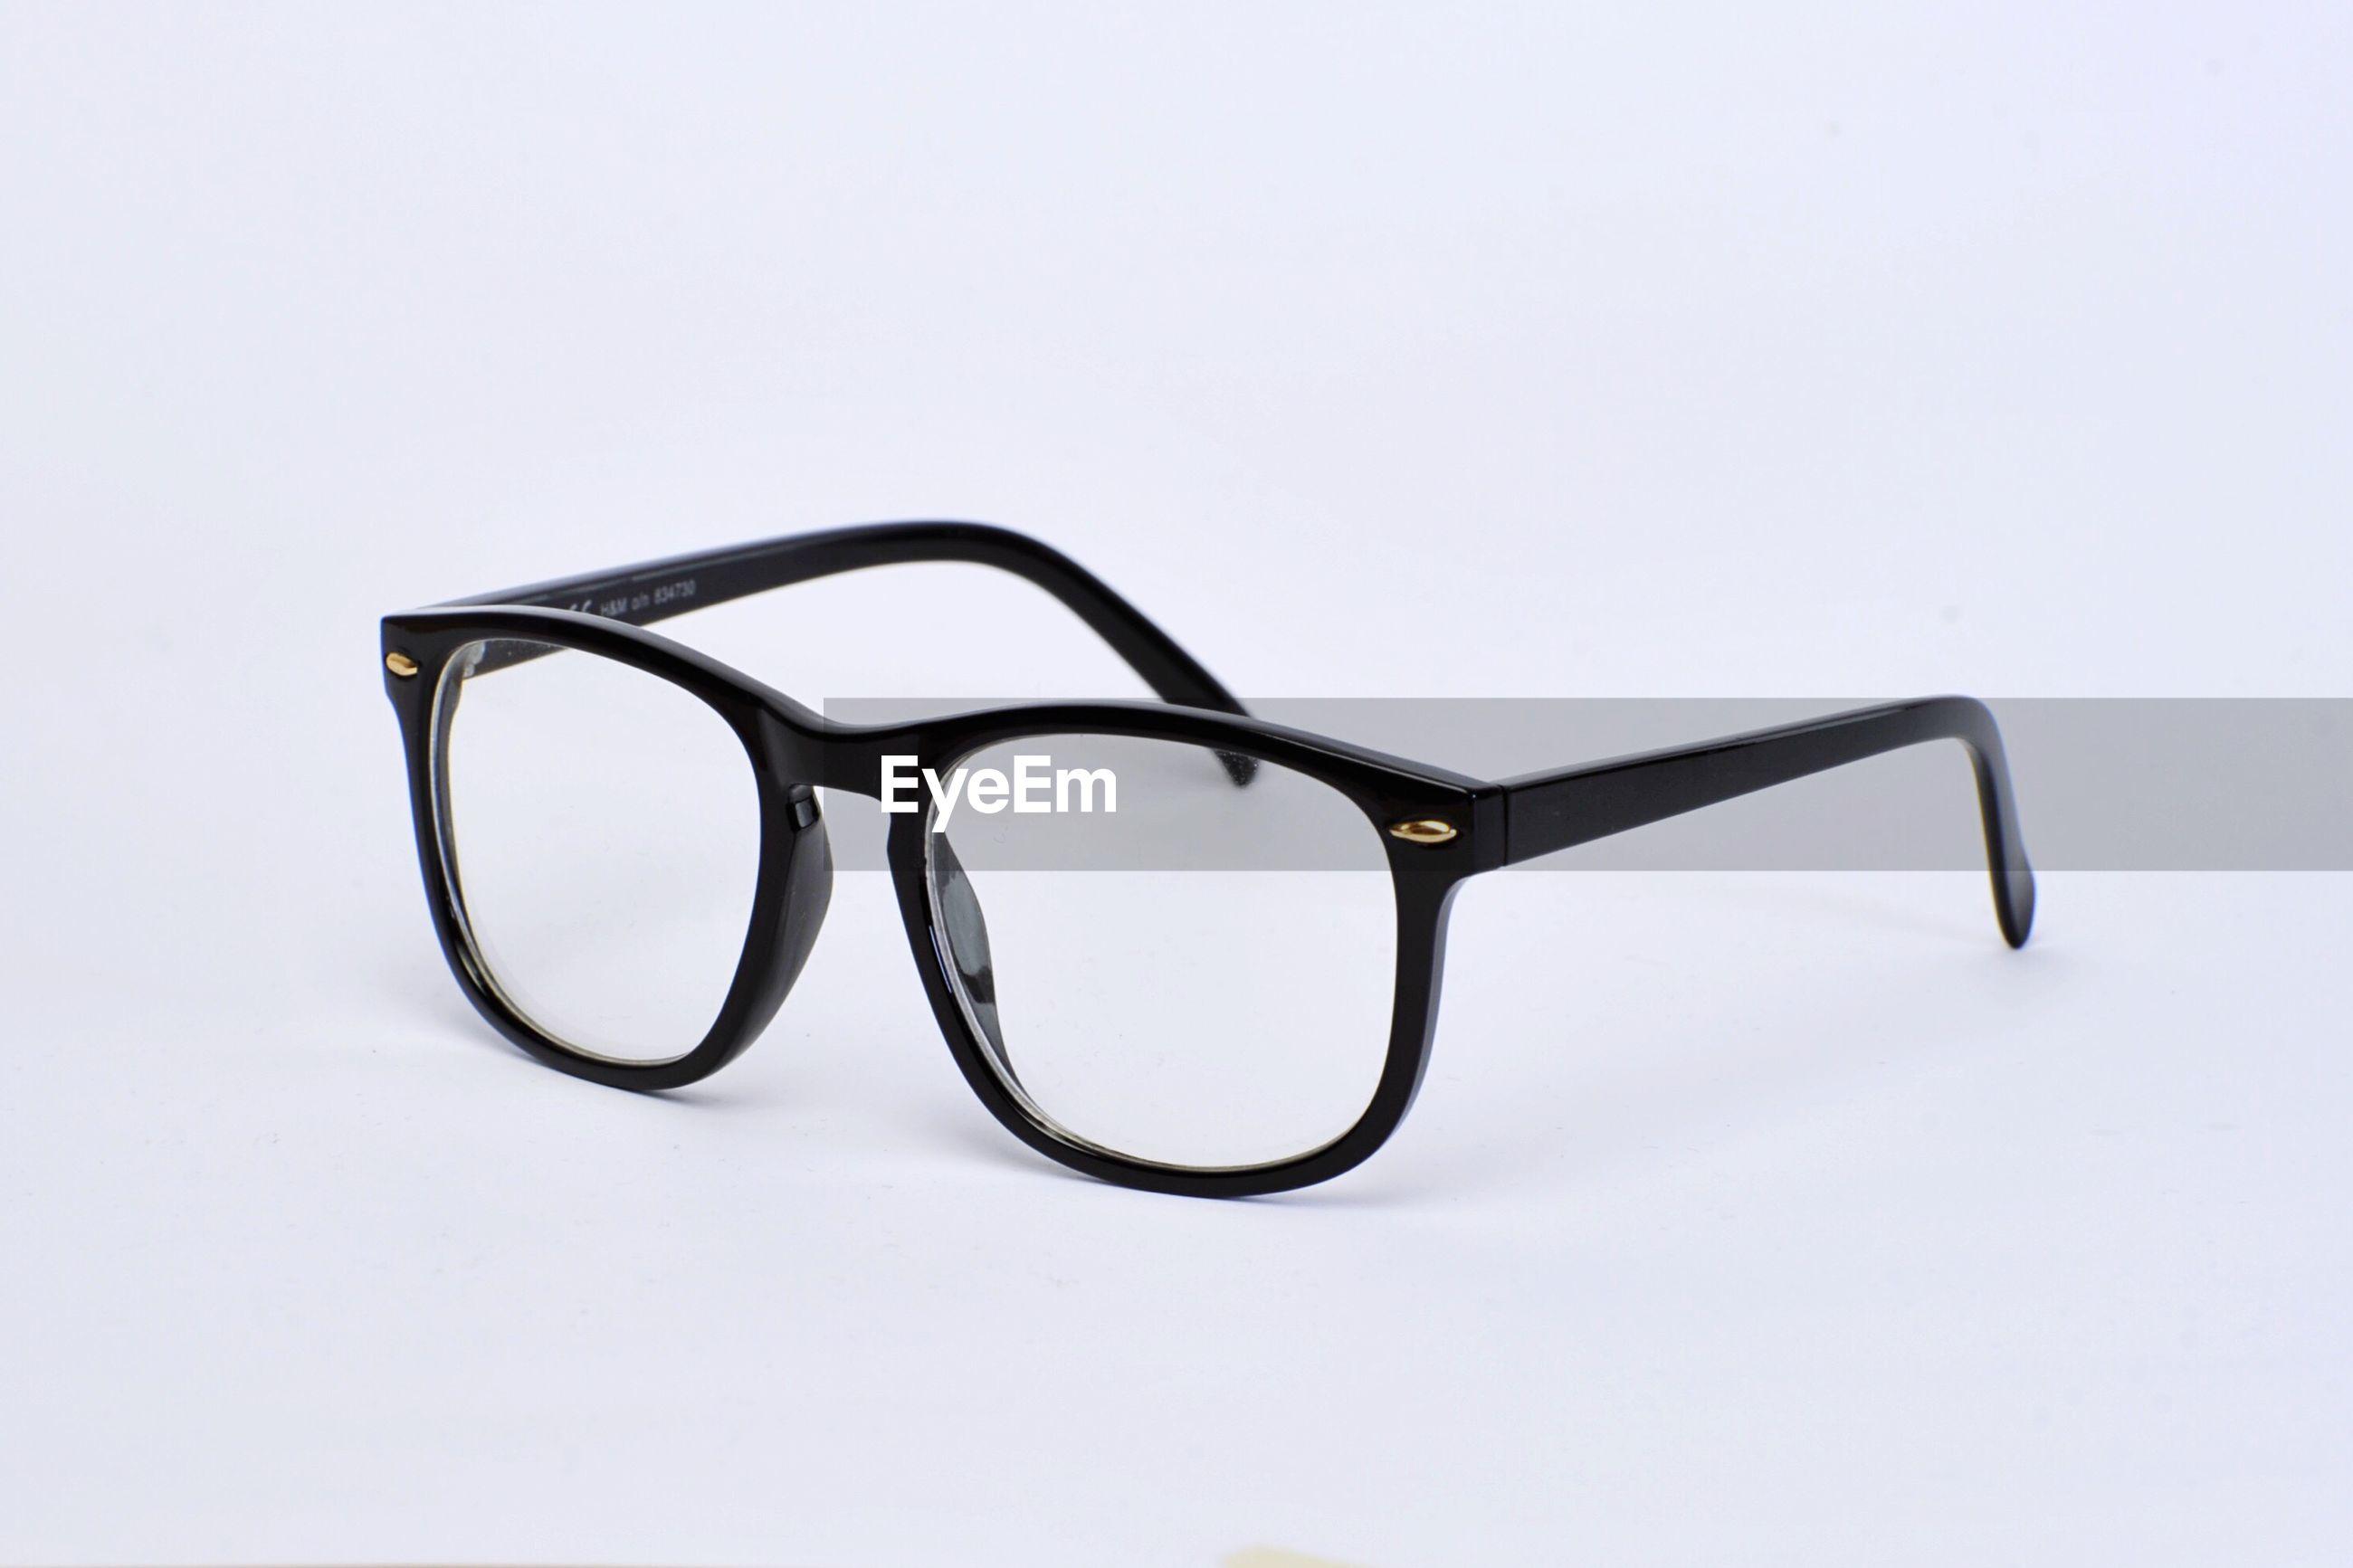 Close-up of eyeglasses over white background